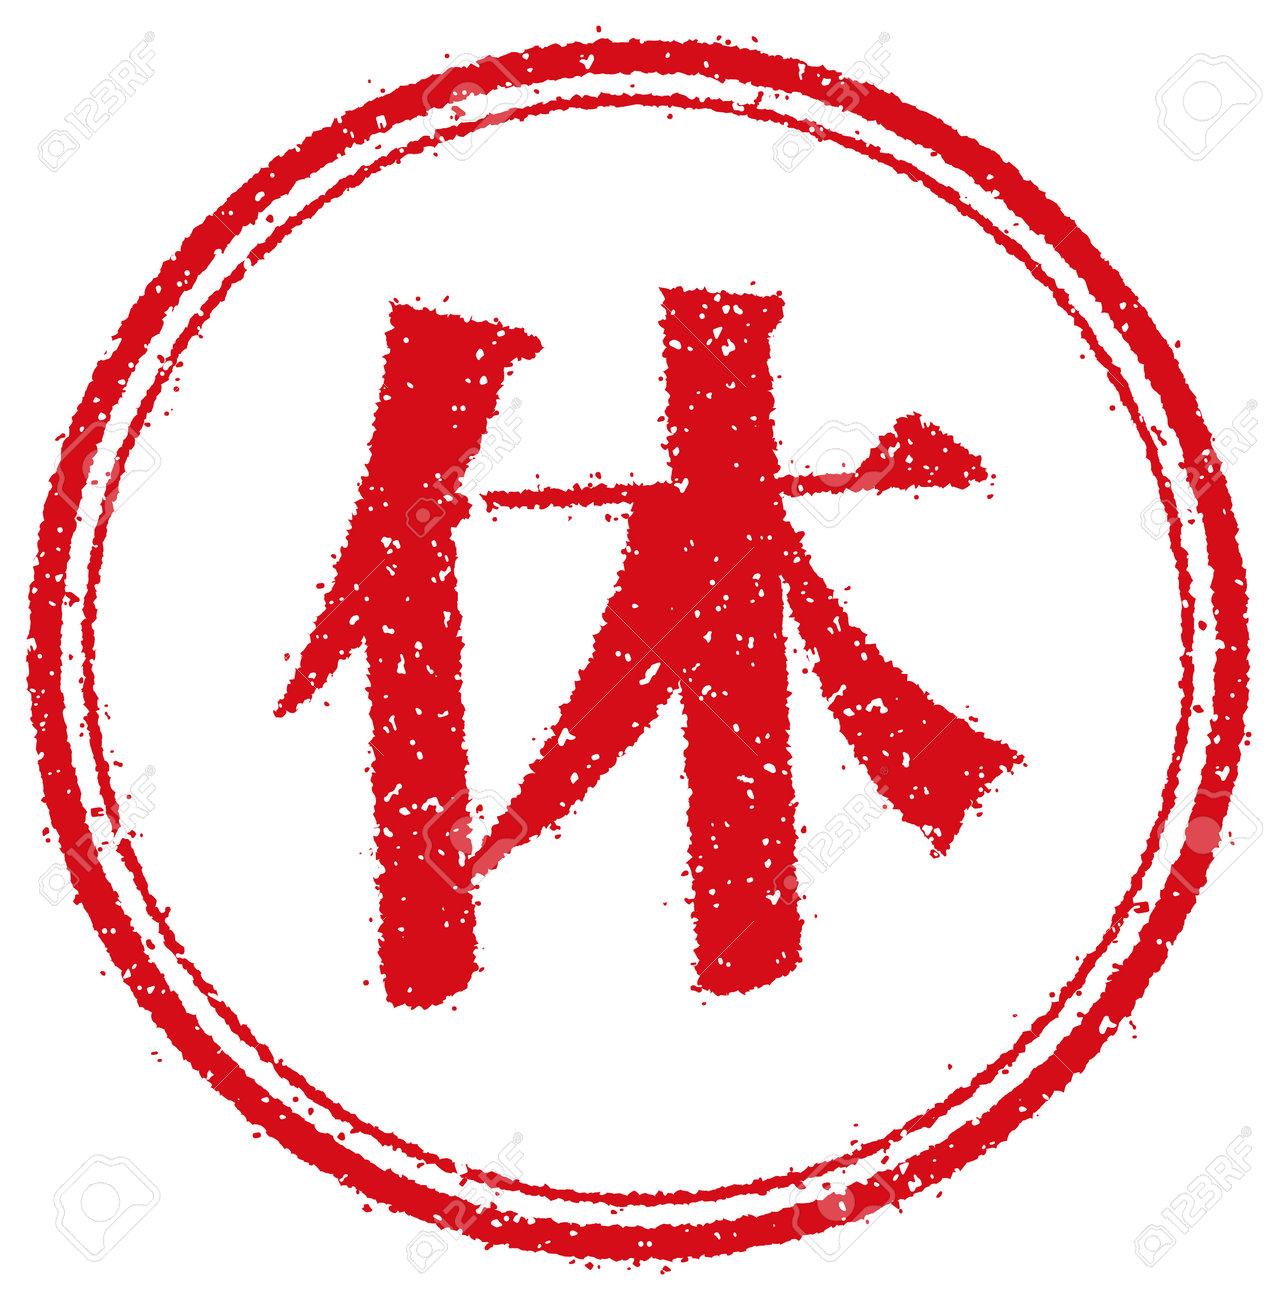 Rubber stamp illustration for Japanese business | rest, stop - 168732364